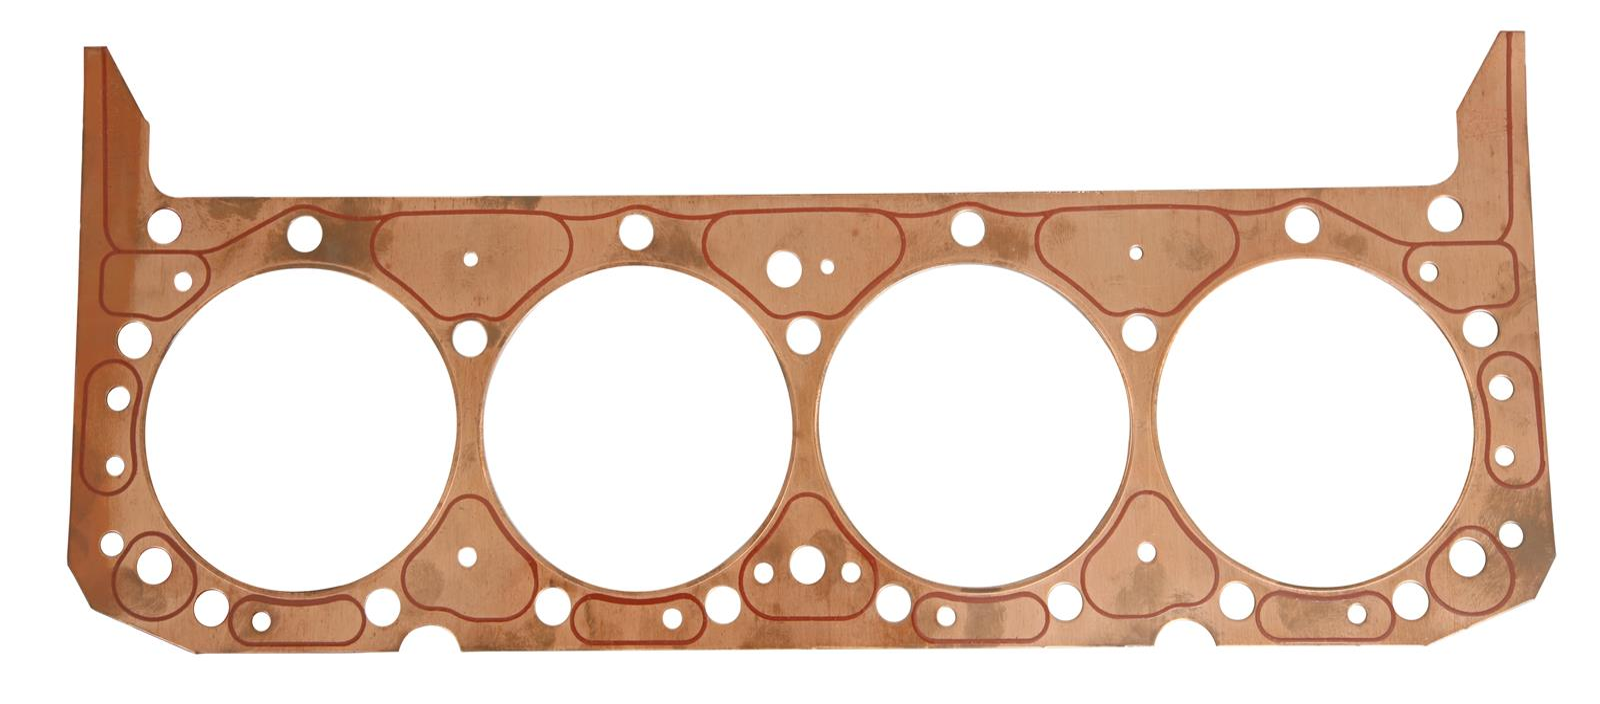 SCE Gasket S36156 ICS Titan 4.155 x 0.062 Copper Head Gasket 2 Piece